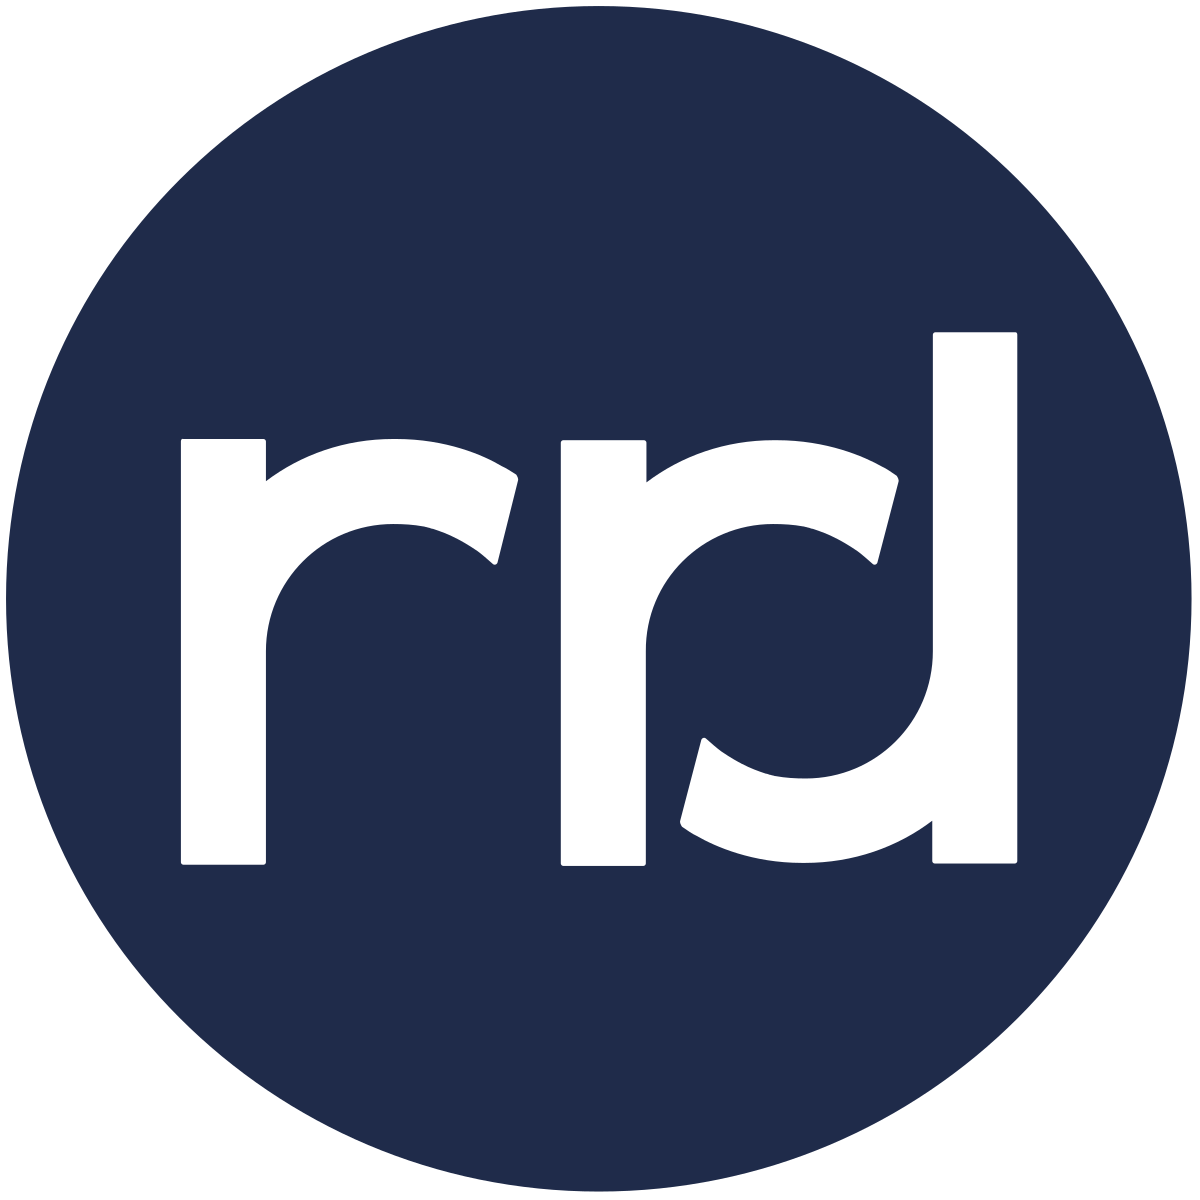 RR Donnelley's logo